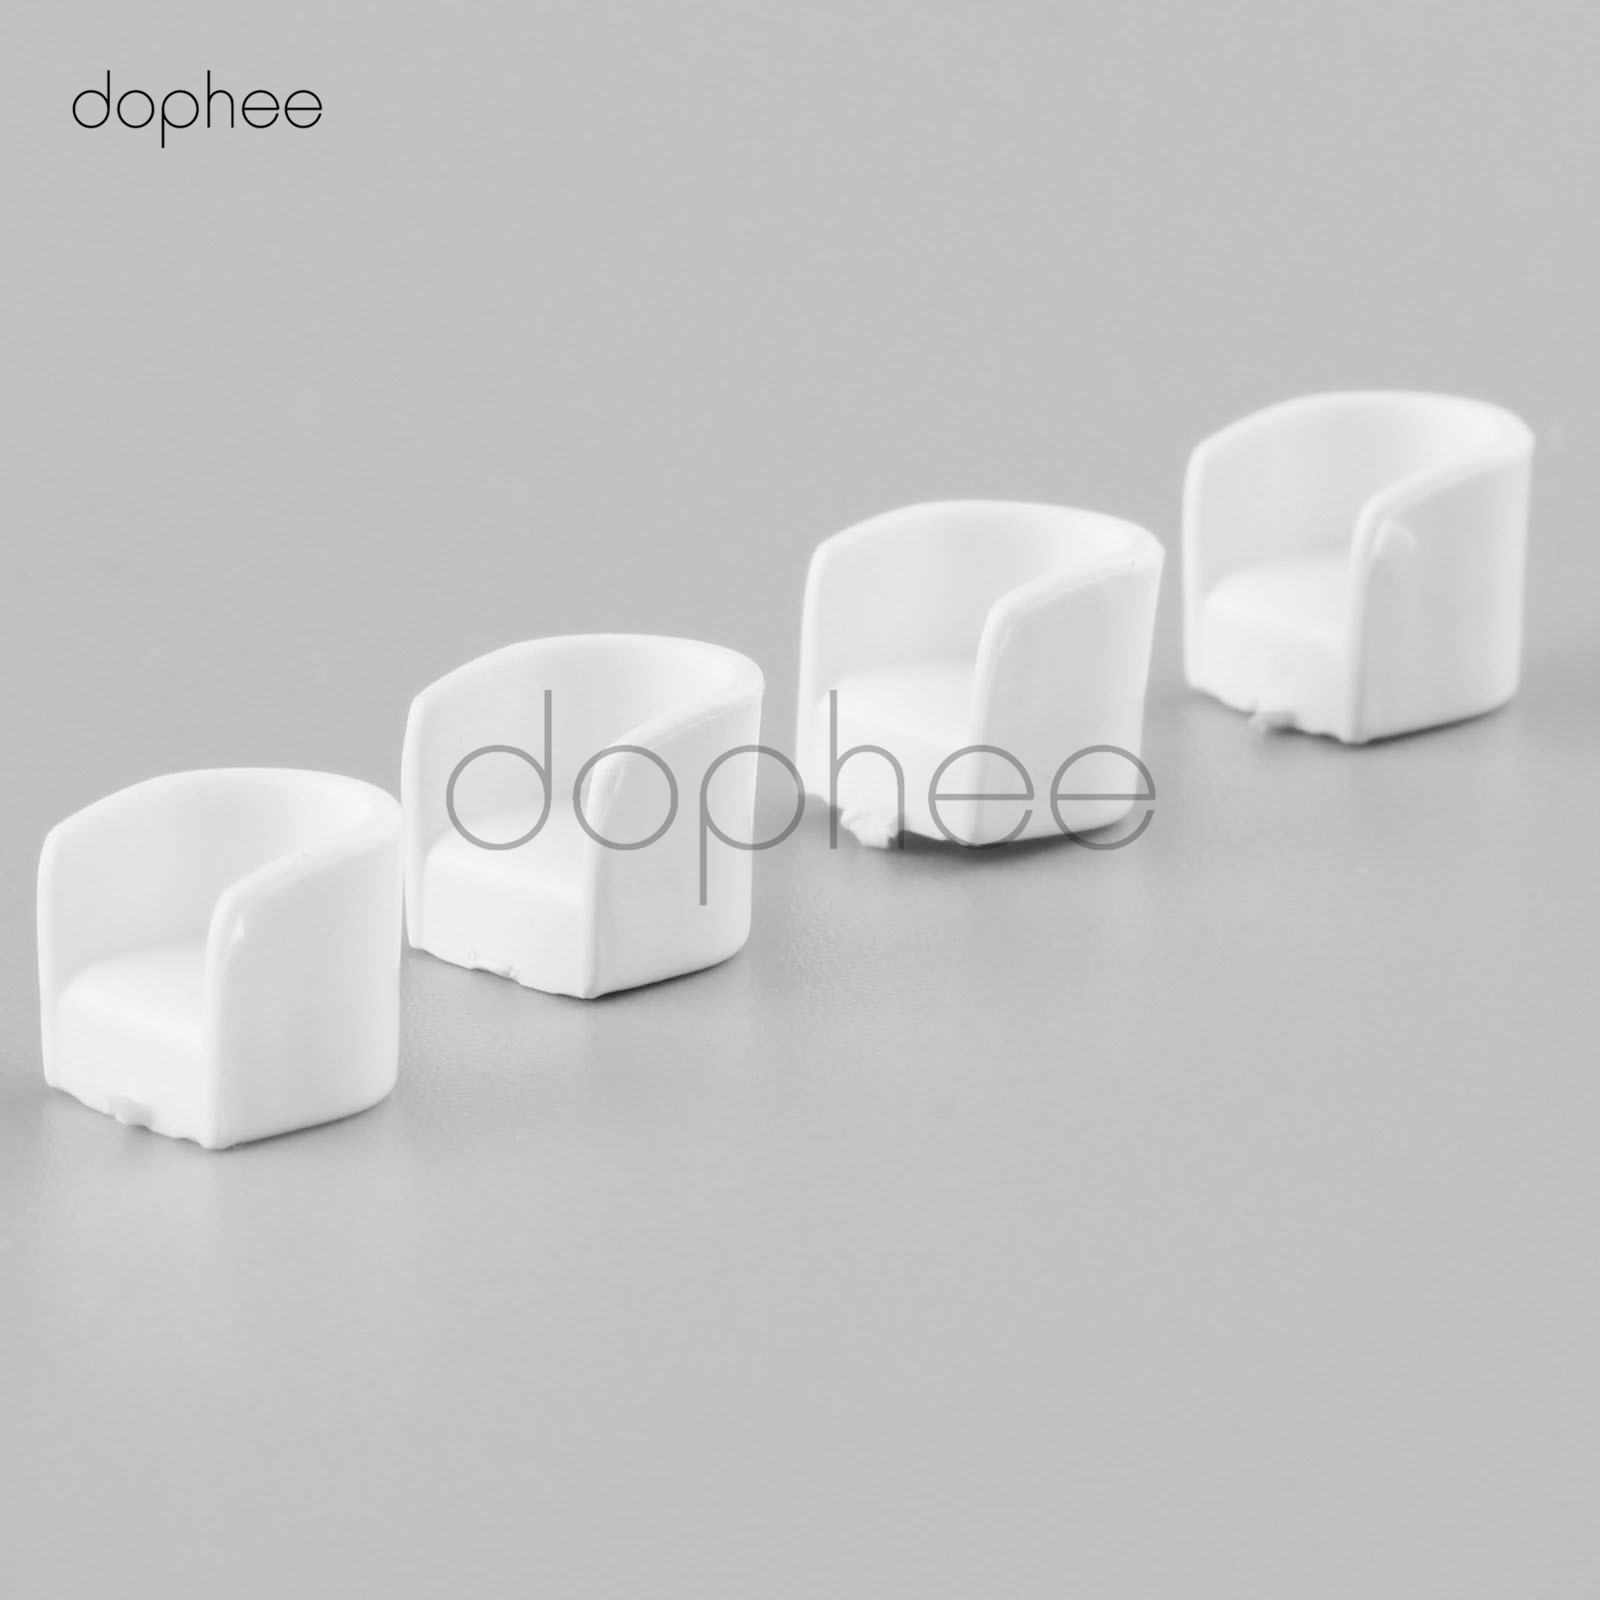 dophee 20pcs White Round sofa chair Model 1:75 Plastic DIY sand table model material